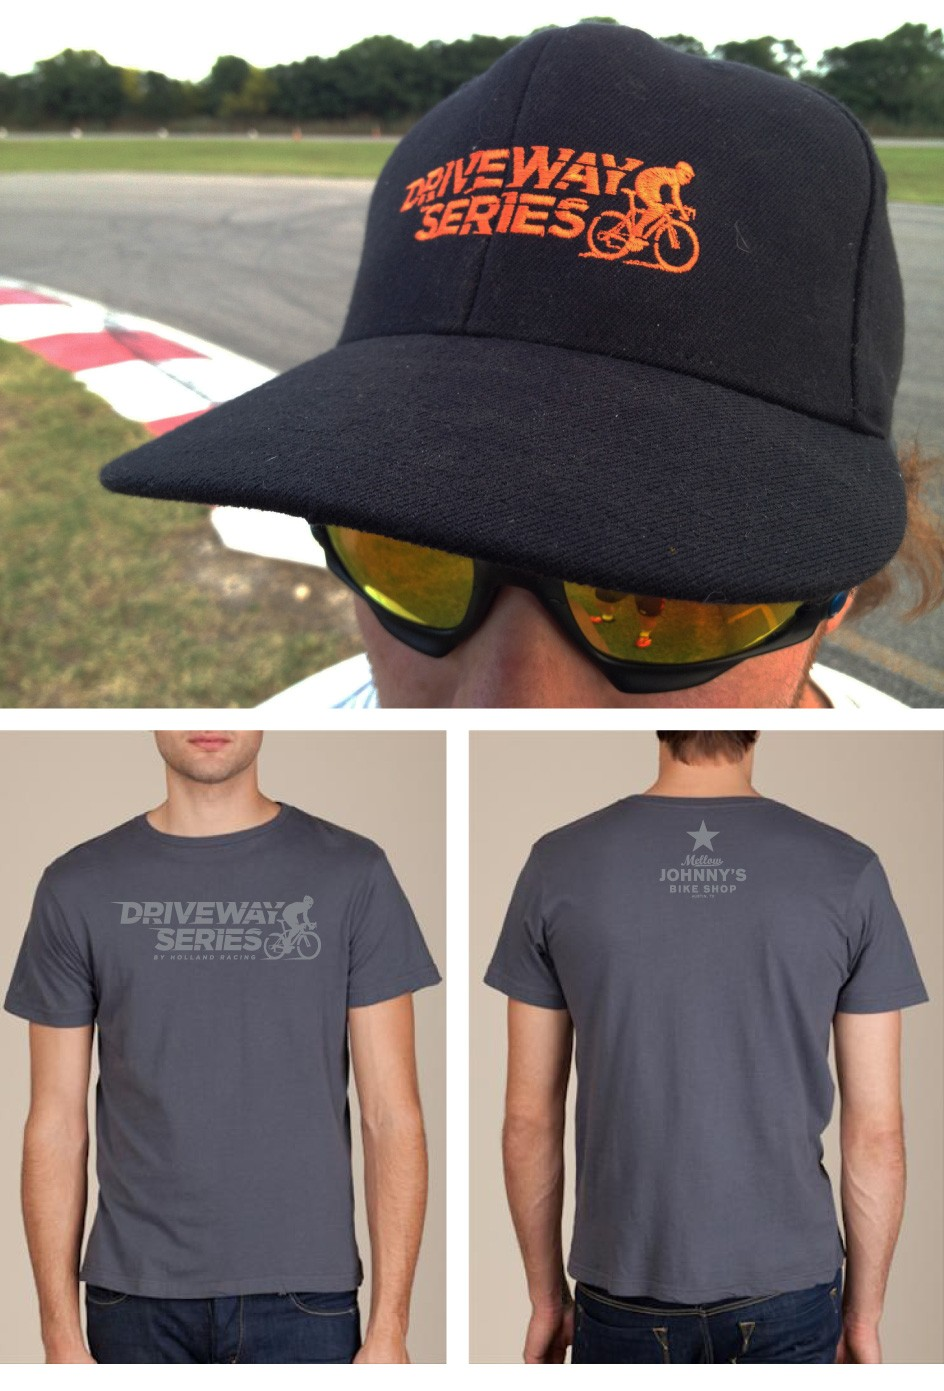 Driveway Series Hat & T-Shirt